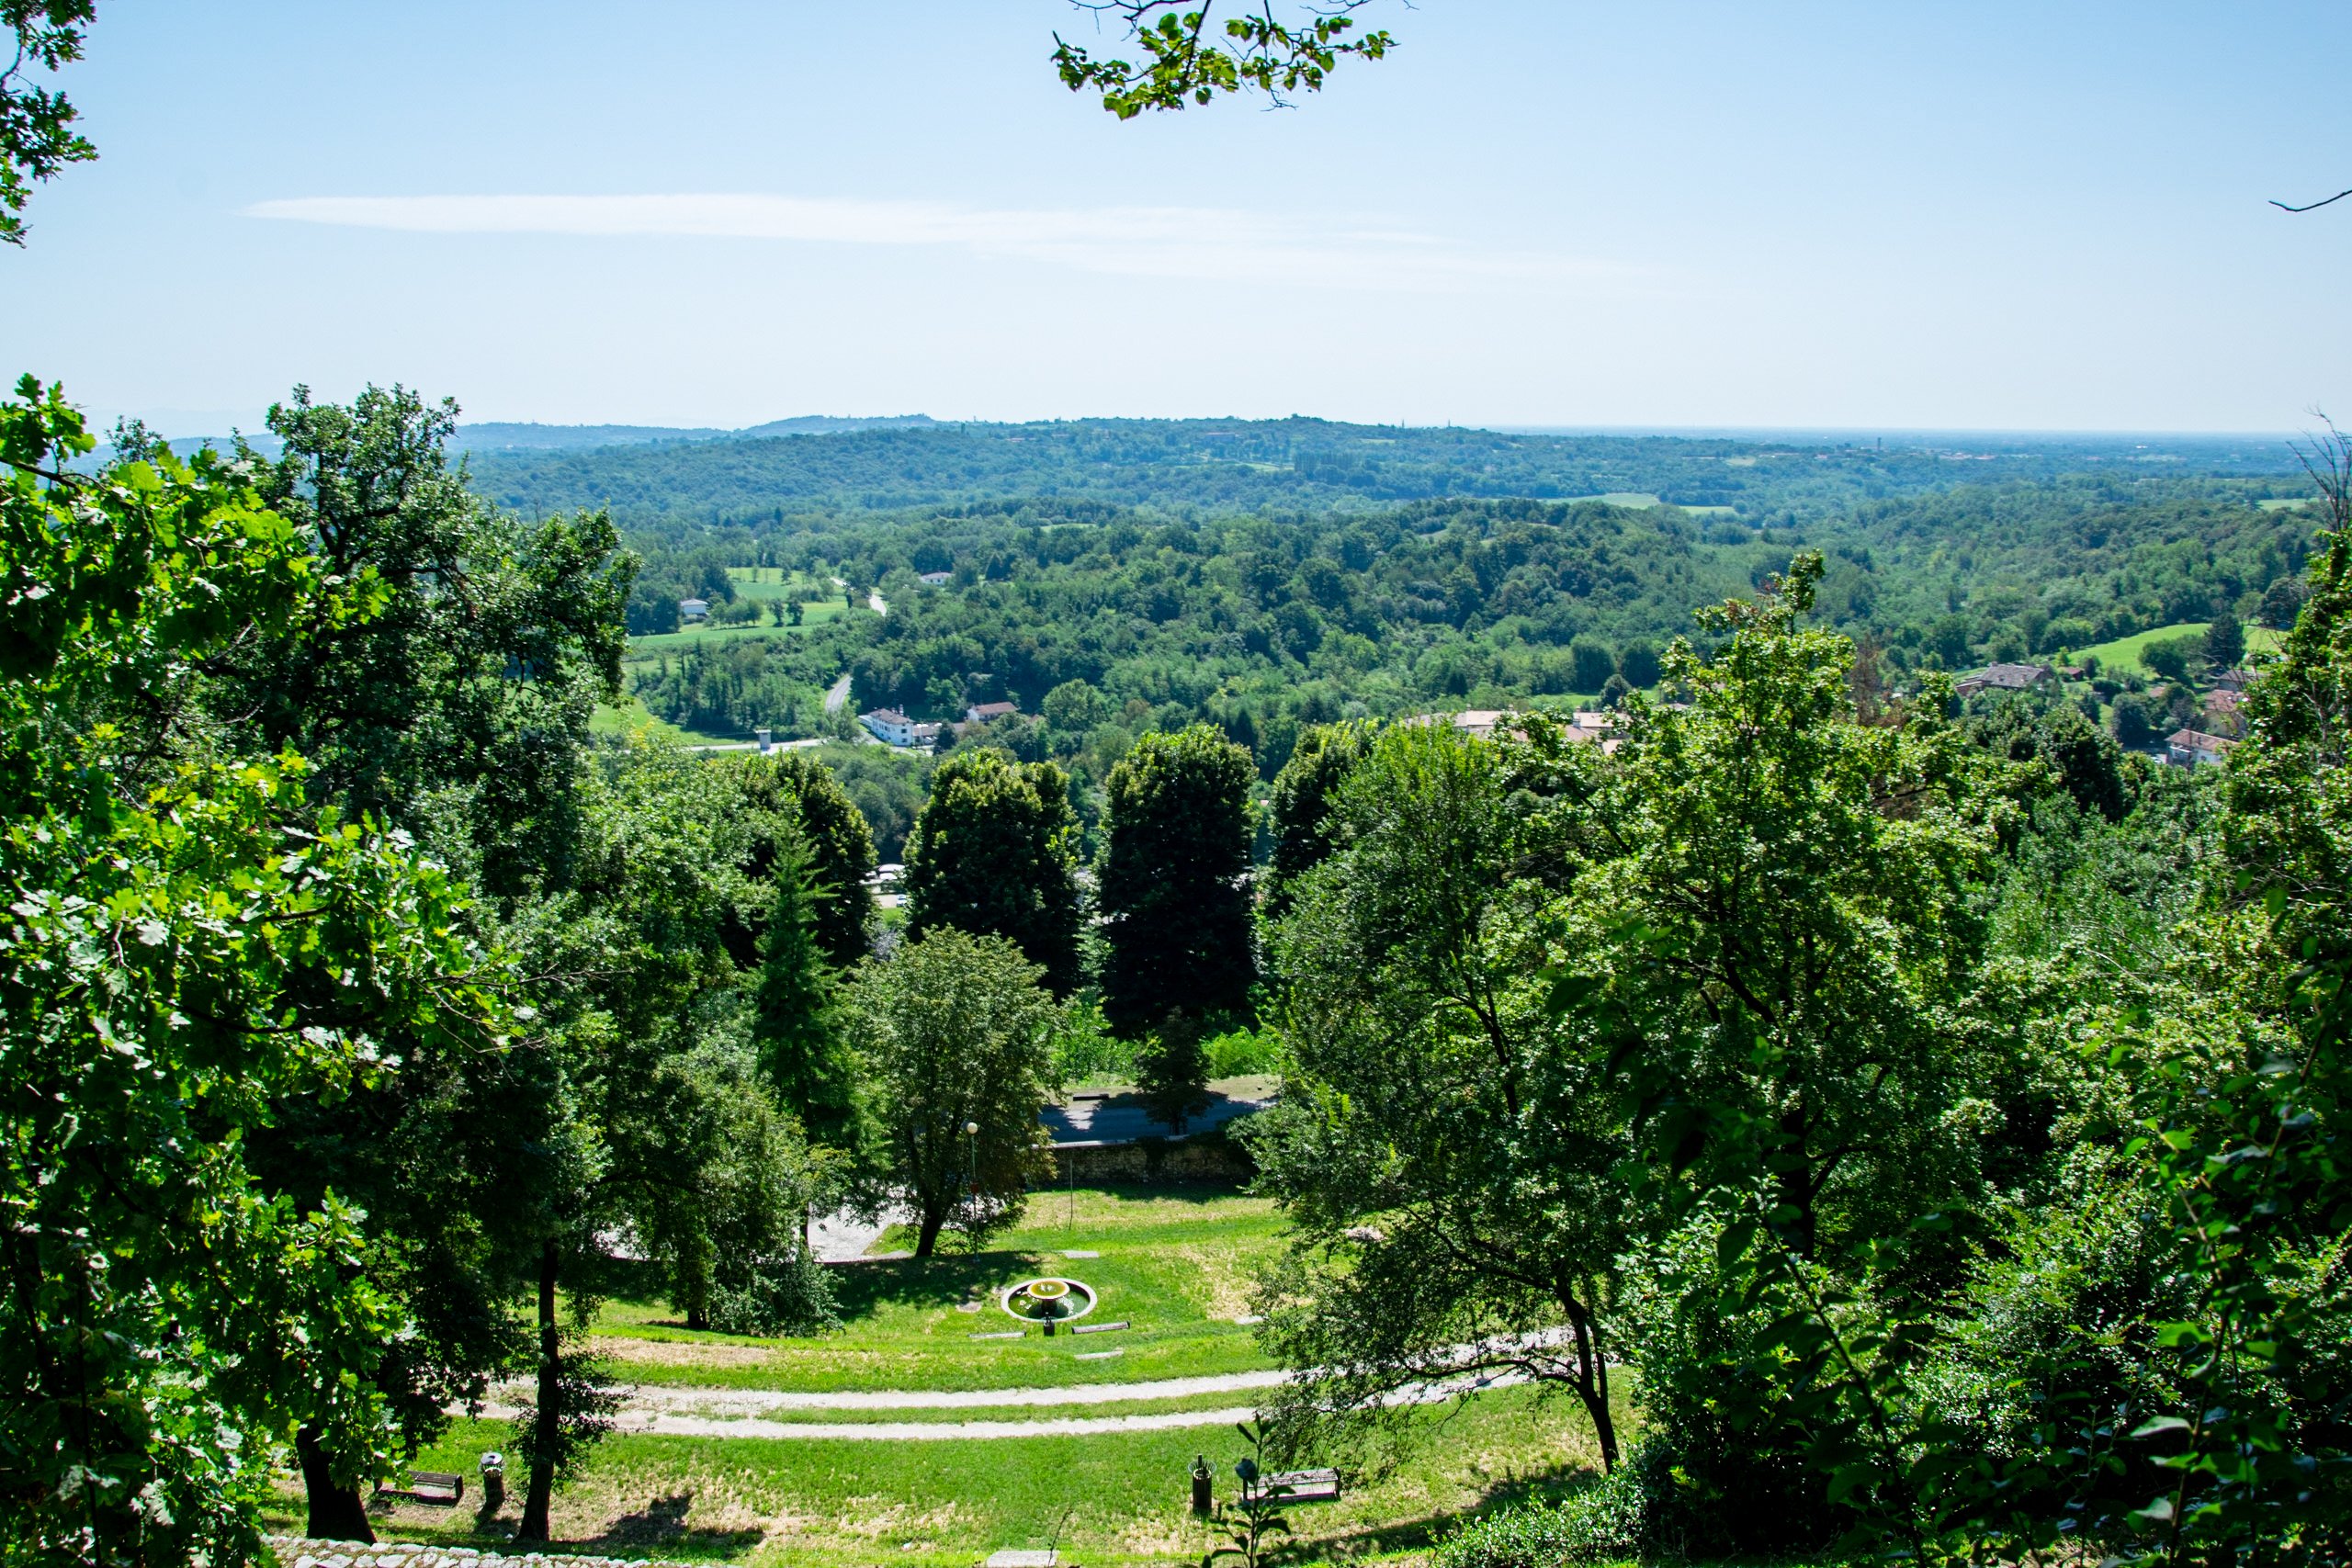 vista dal parco - San Daniele del Friuli